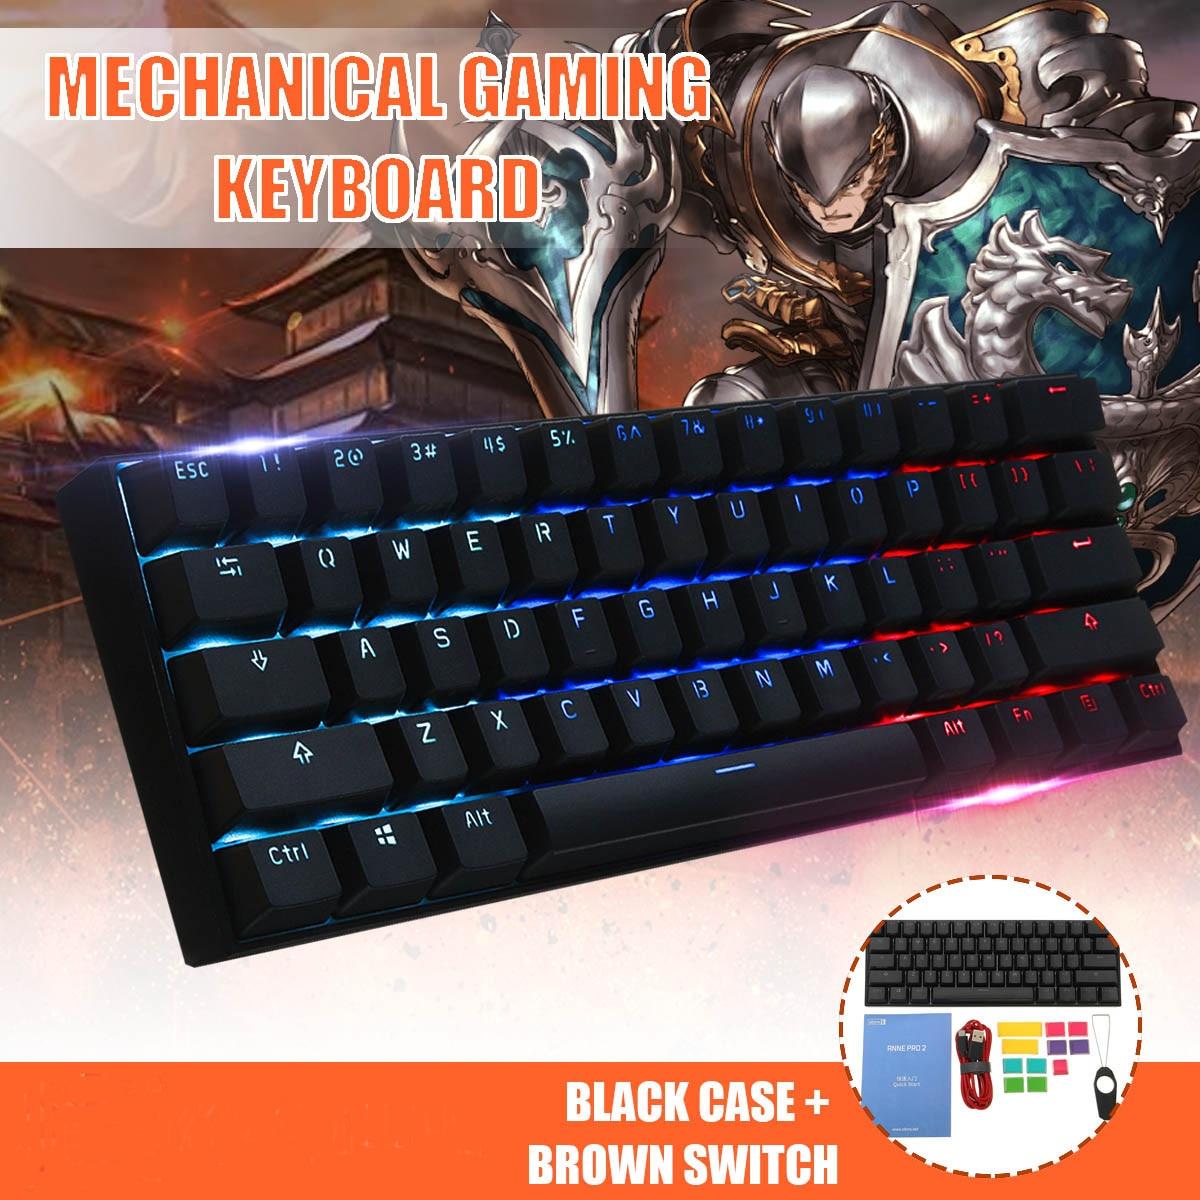 Gateron Switch version Obins Anne NKRO bluetooth 4.0 Type C RGB Mechanical Gaming Keyboard Computer Peripherals